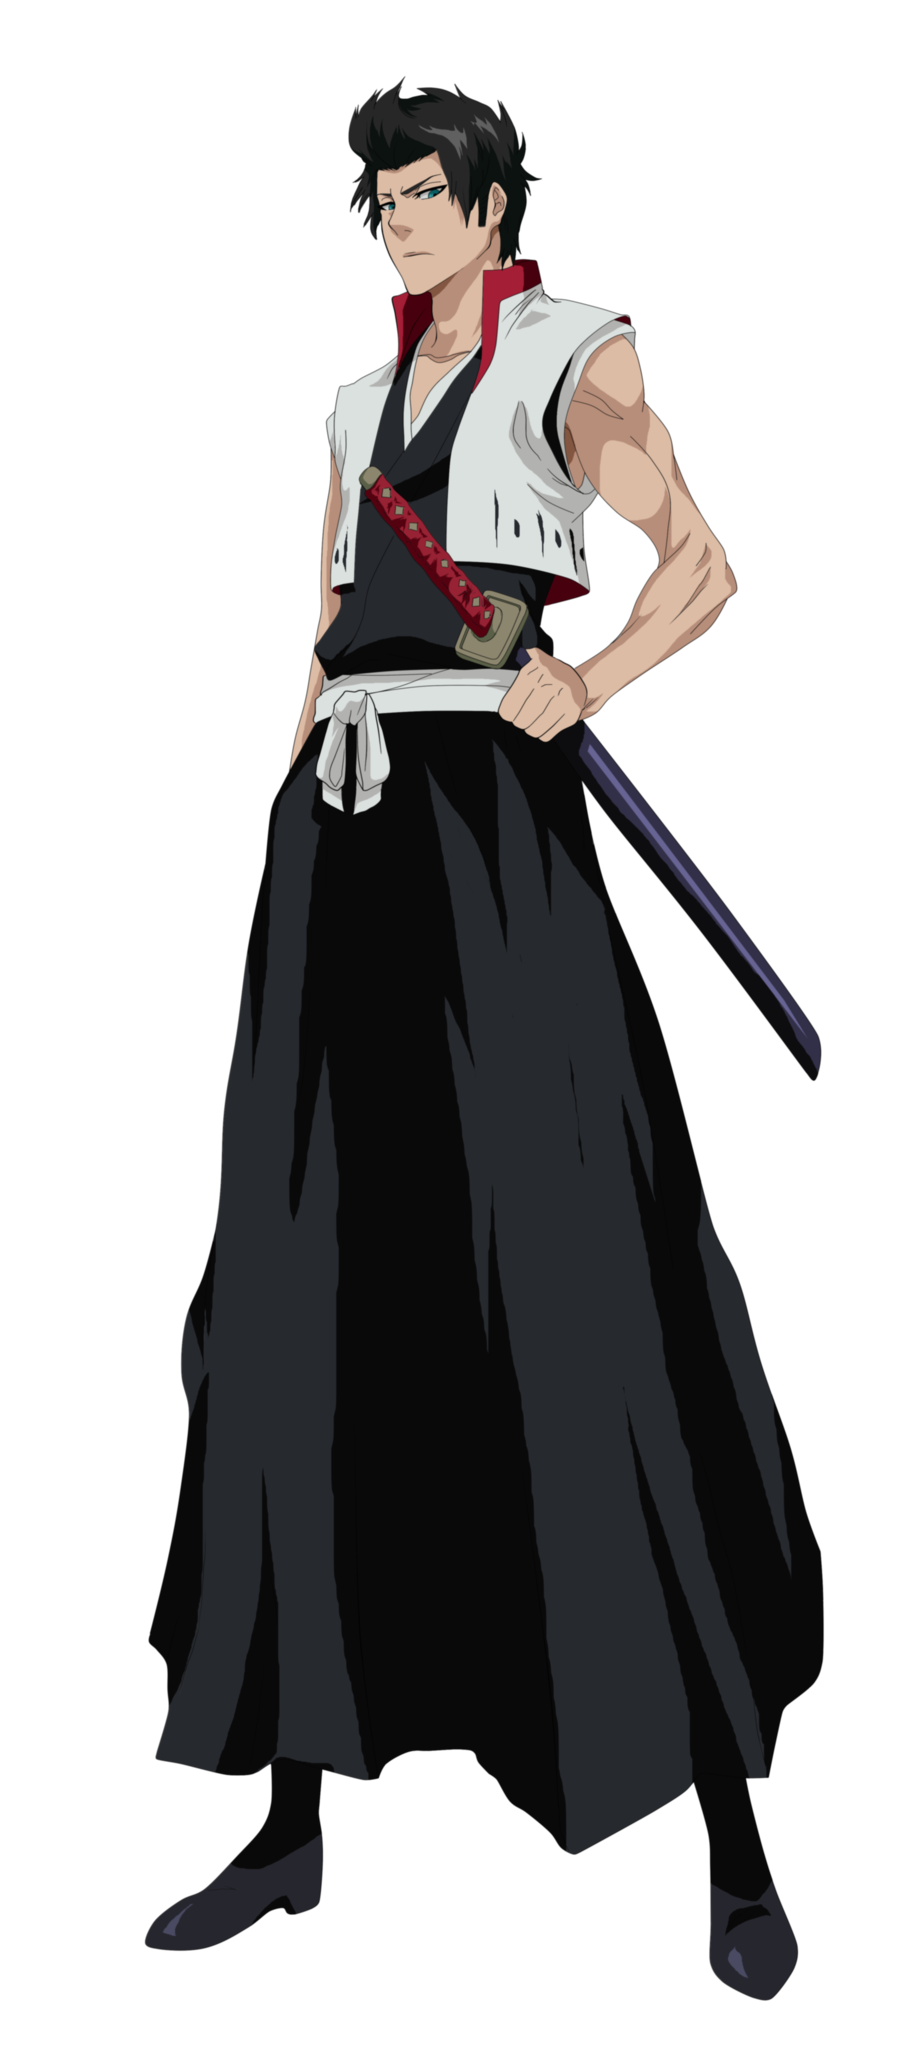 Satomaru Morimoto Fullbody por ZanpakutoLeader Bleach